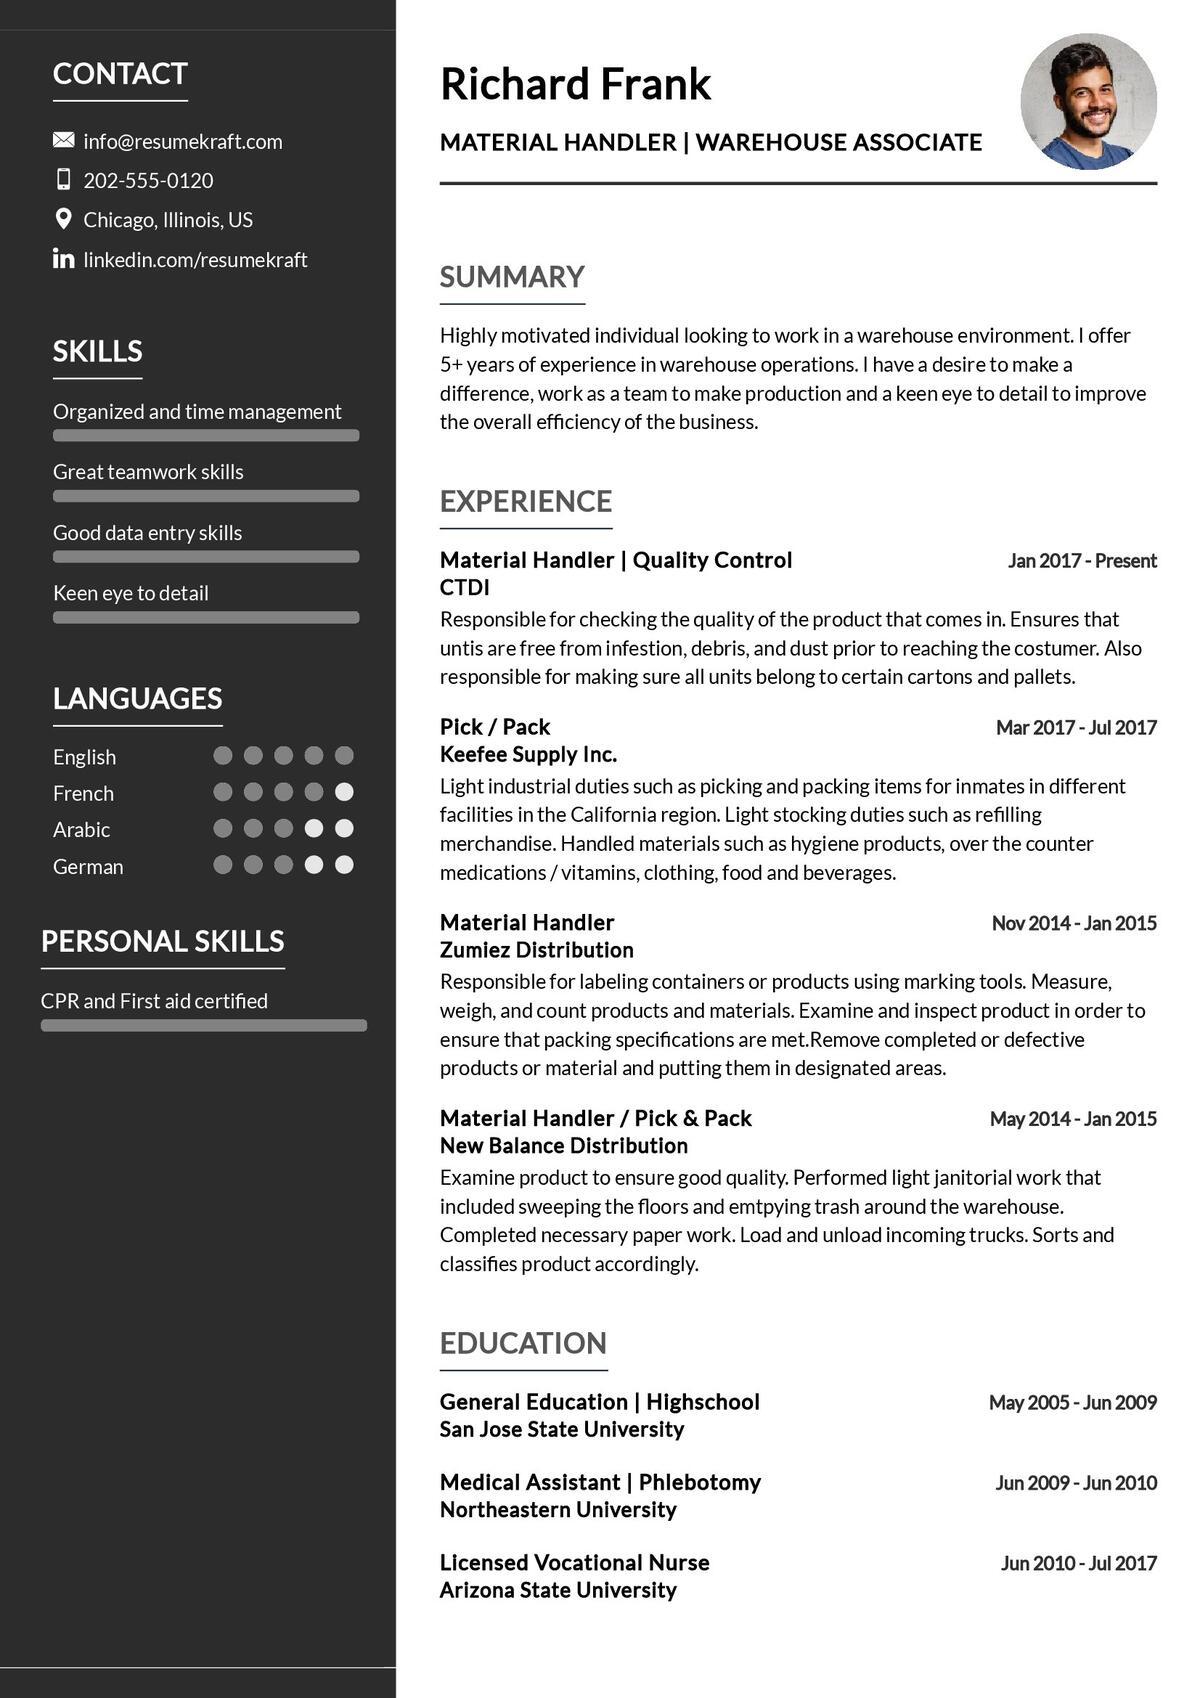 Warehouse Associate CV Sample